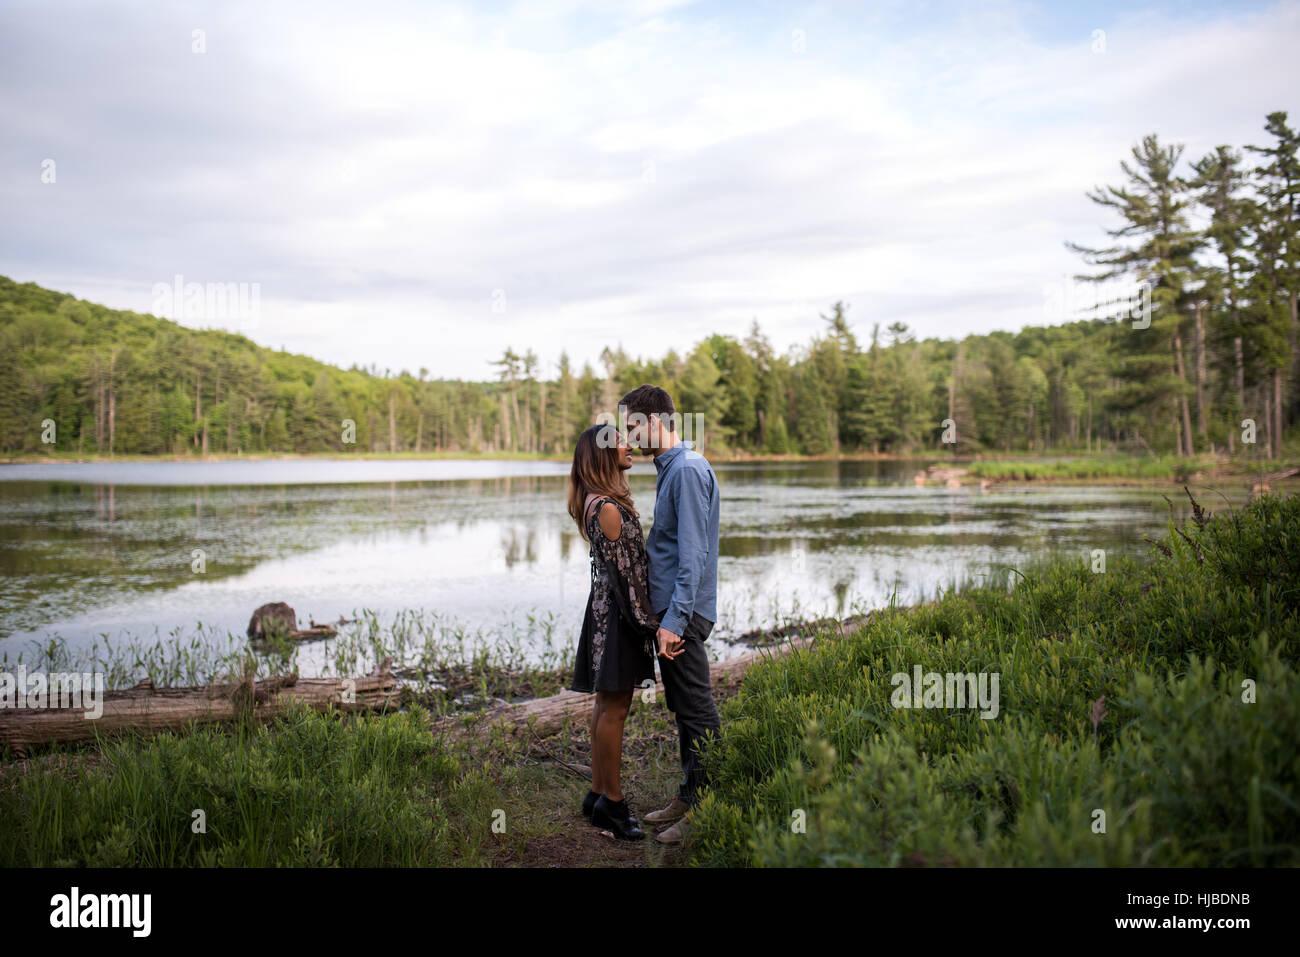 Couple rubbing noses by lake, Ottawa, Ontario - Stock Image